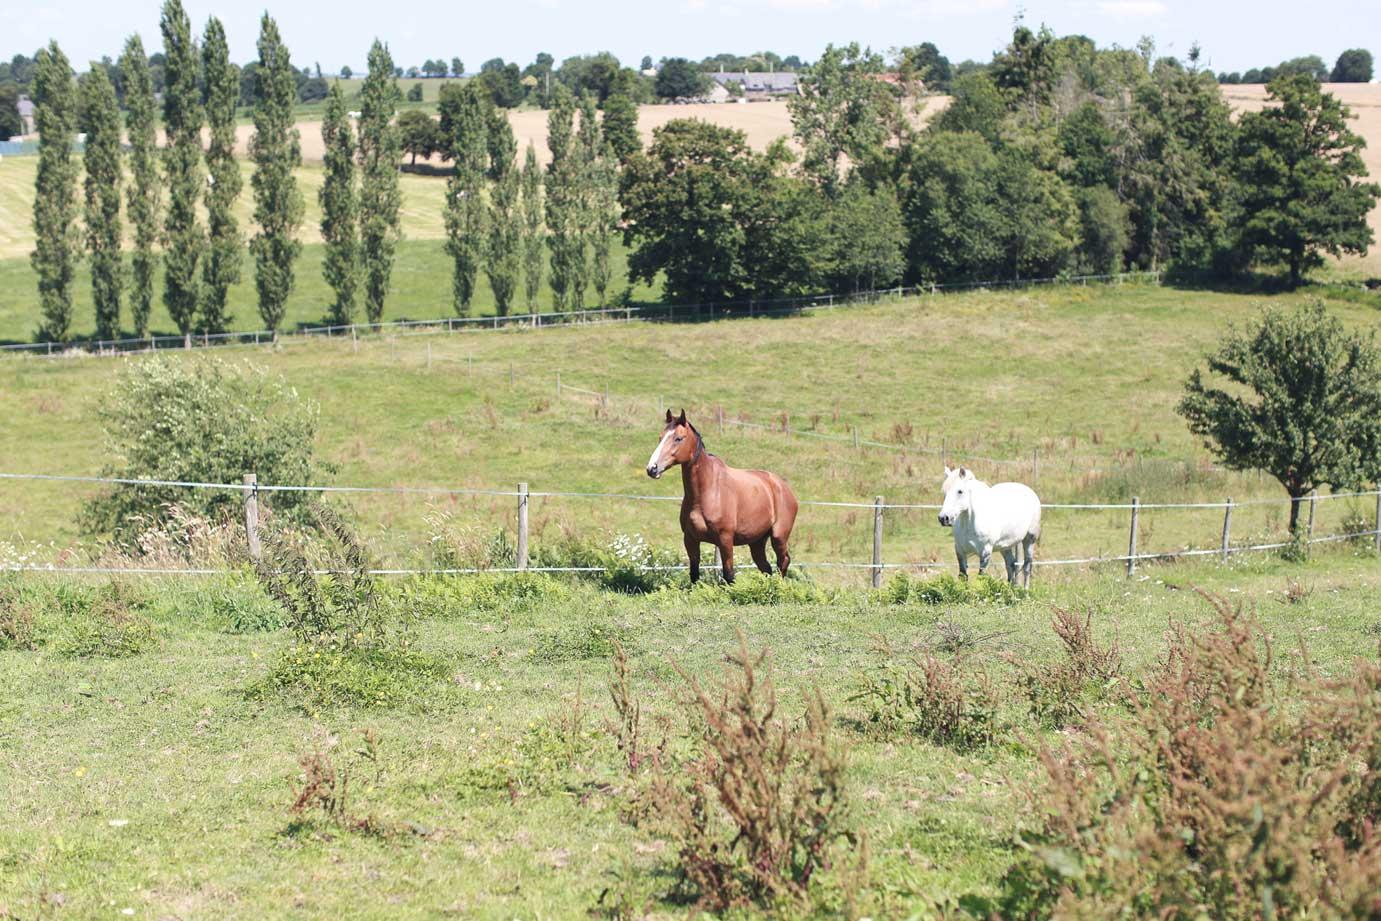 chevaux-paturages-gite-la-hulotte-broceliande-bretagne